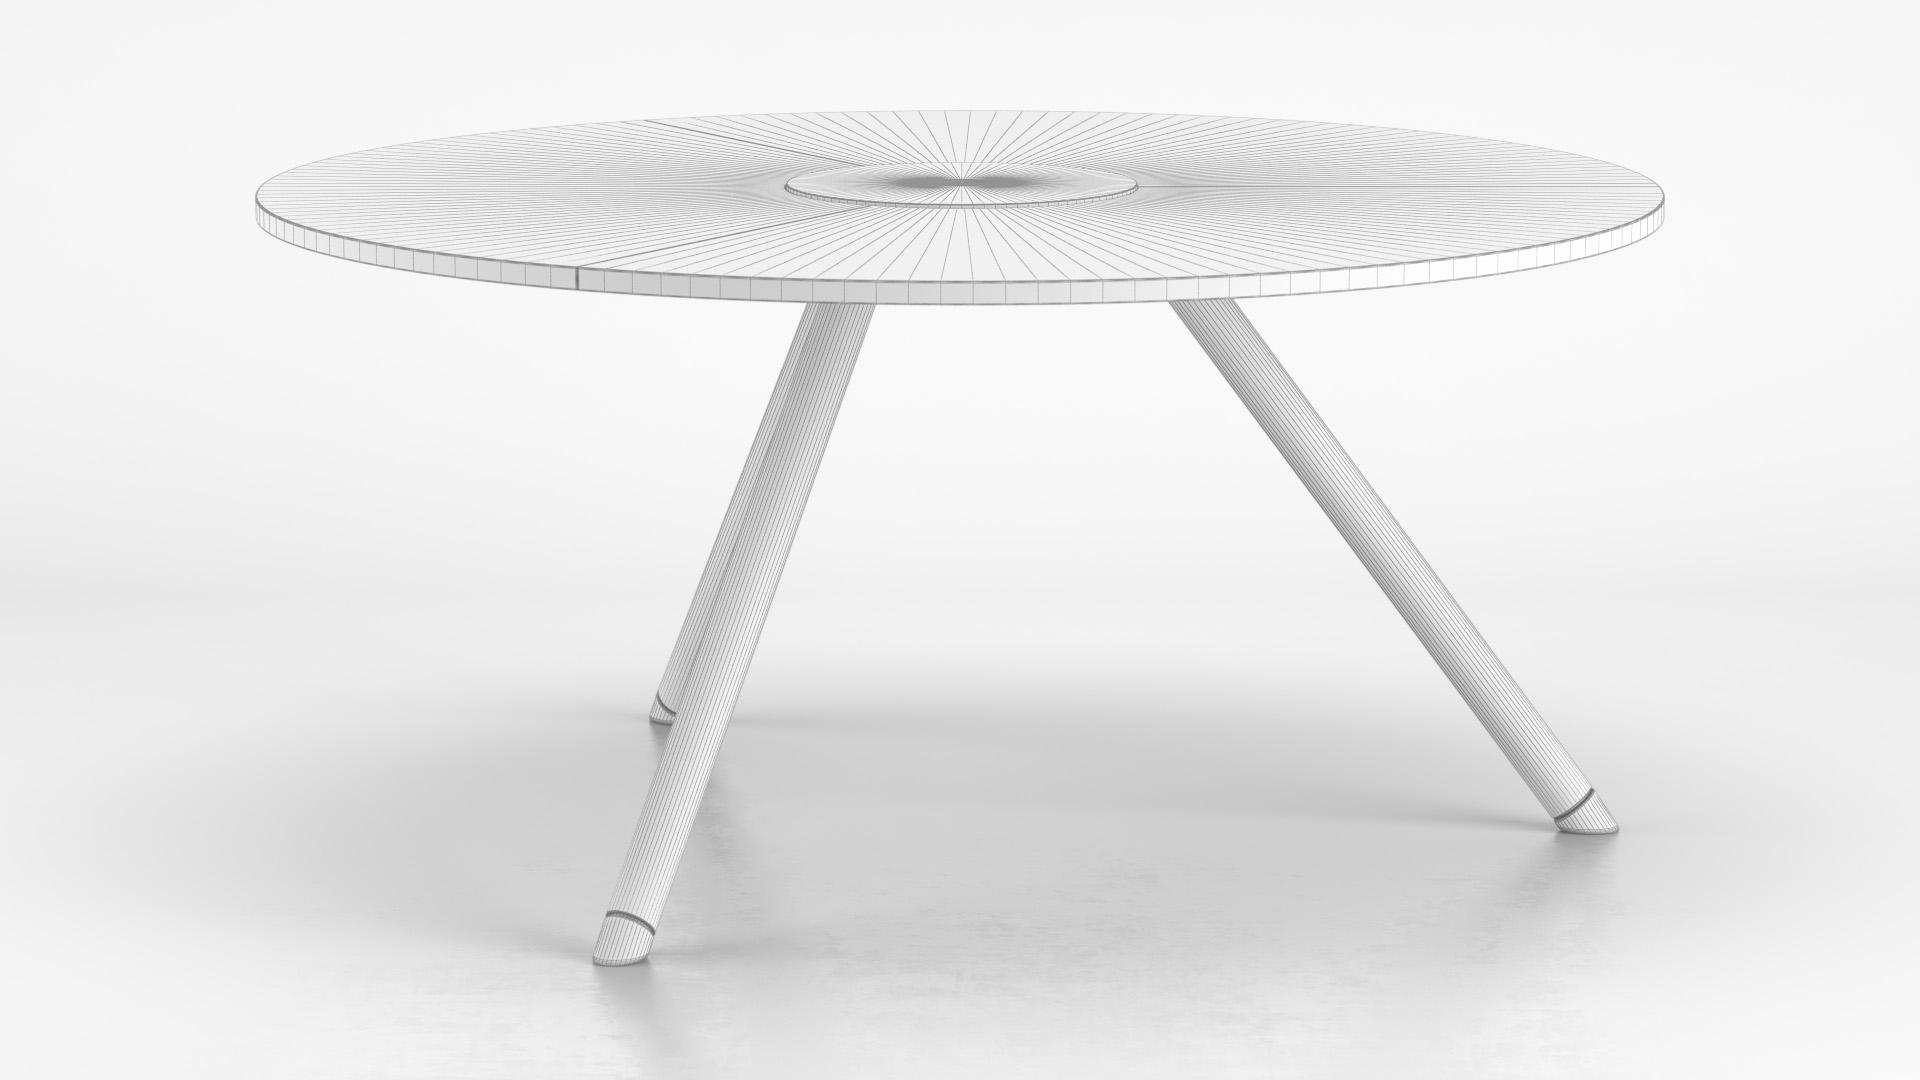 Zenith_Table_WhiteSet_01_wire_0002. Zenith_Table_WhiteSet_01_wire_0003.  Zenith_Table_WhiteSet_01_wire_0004